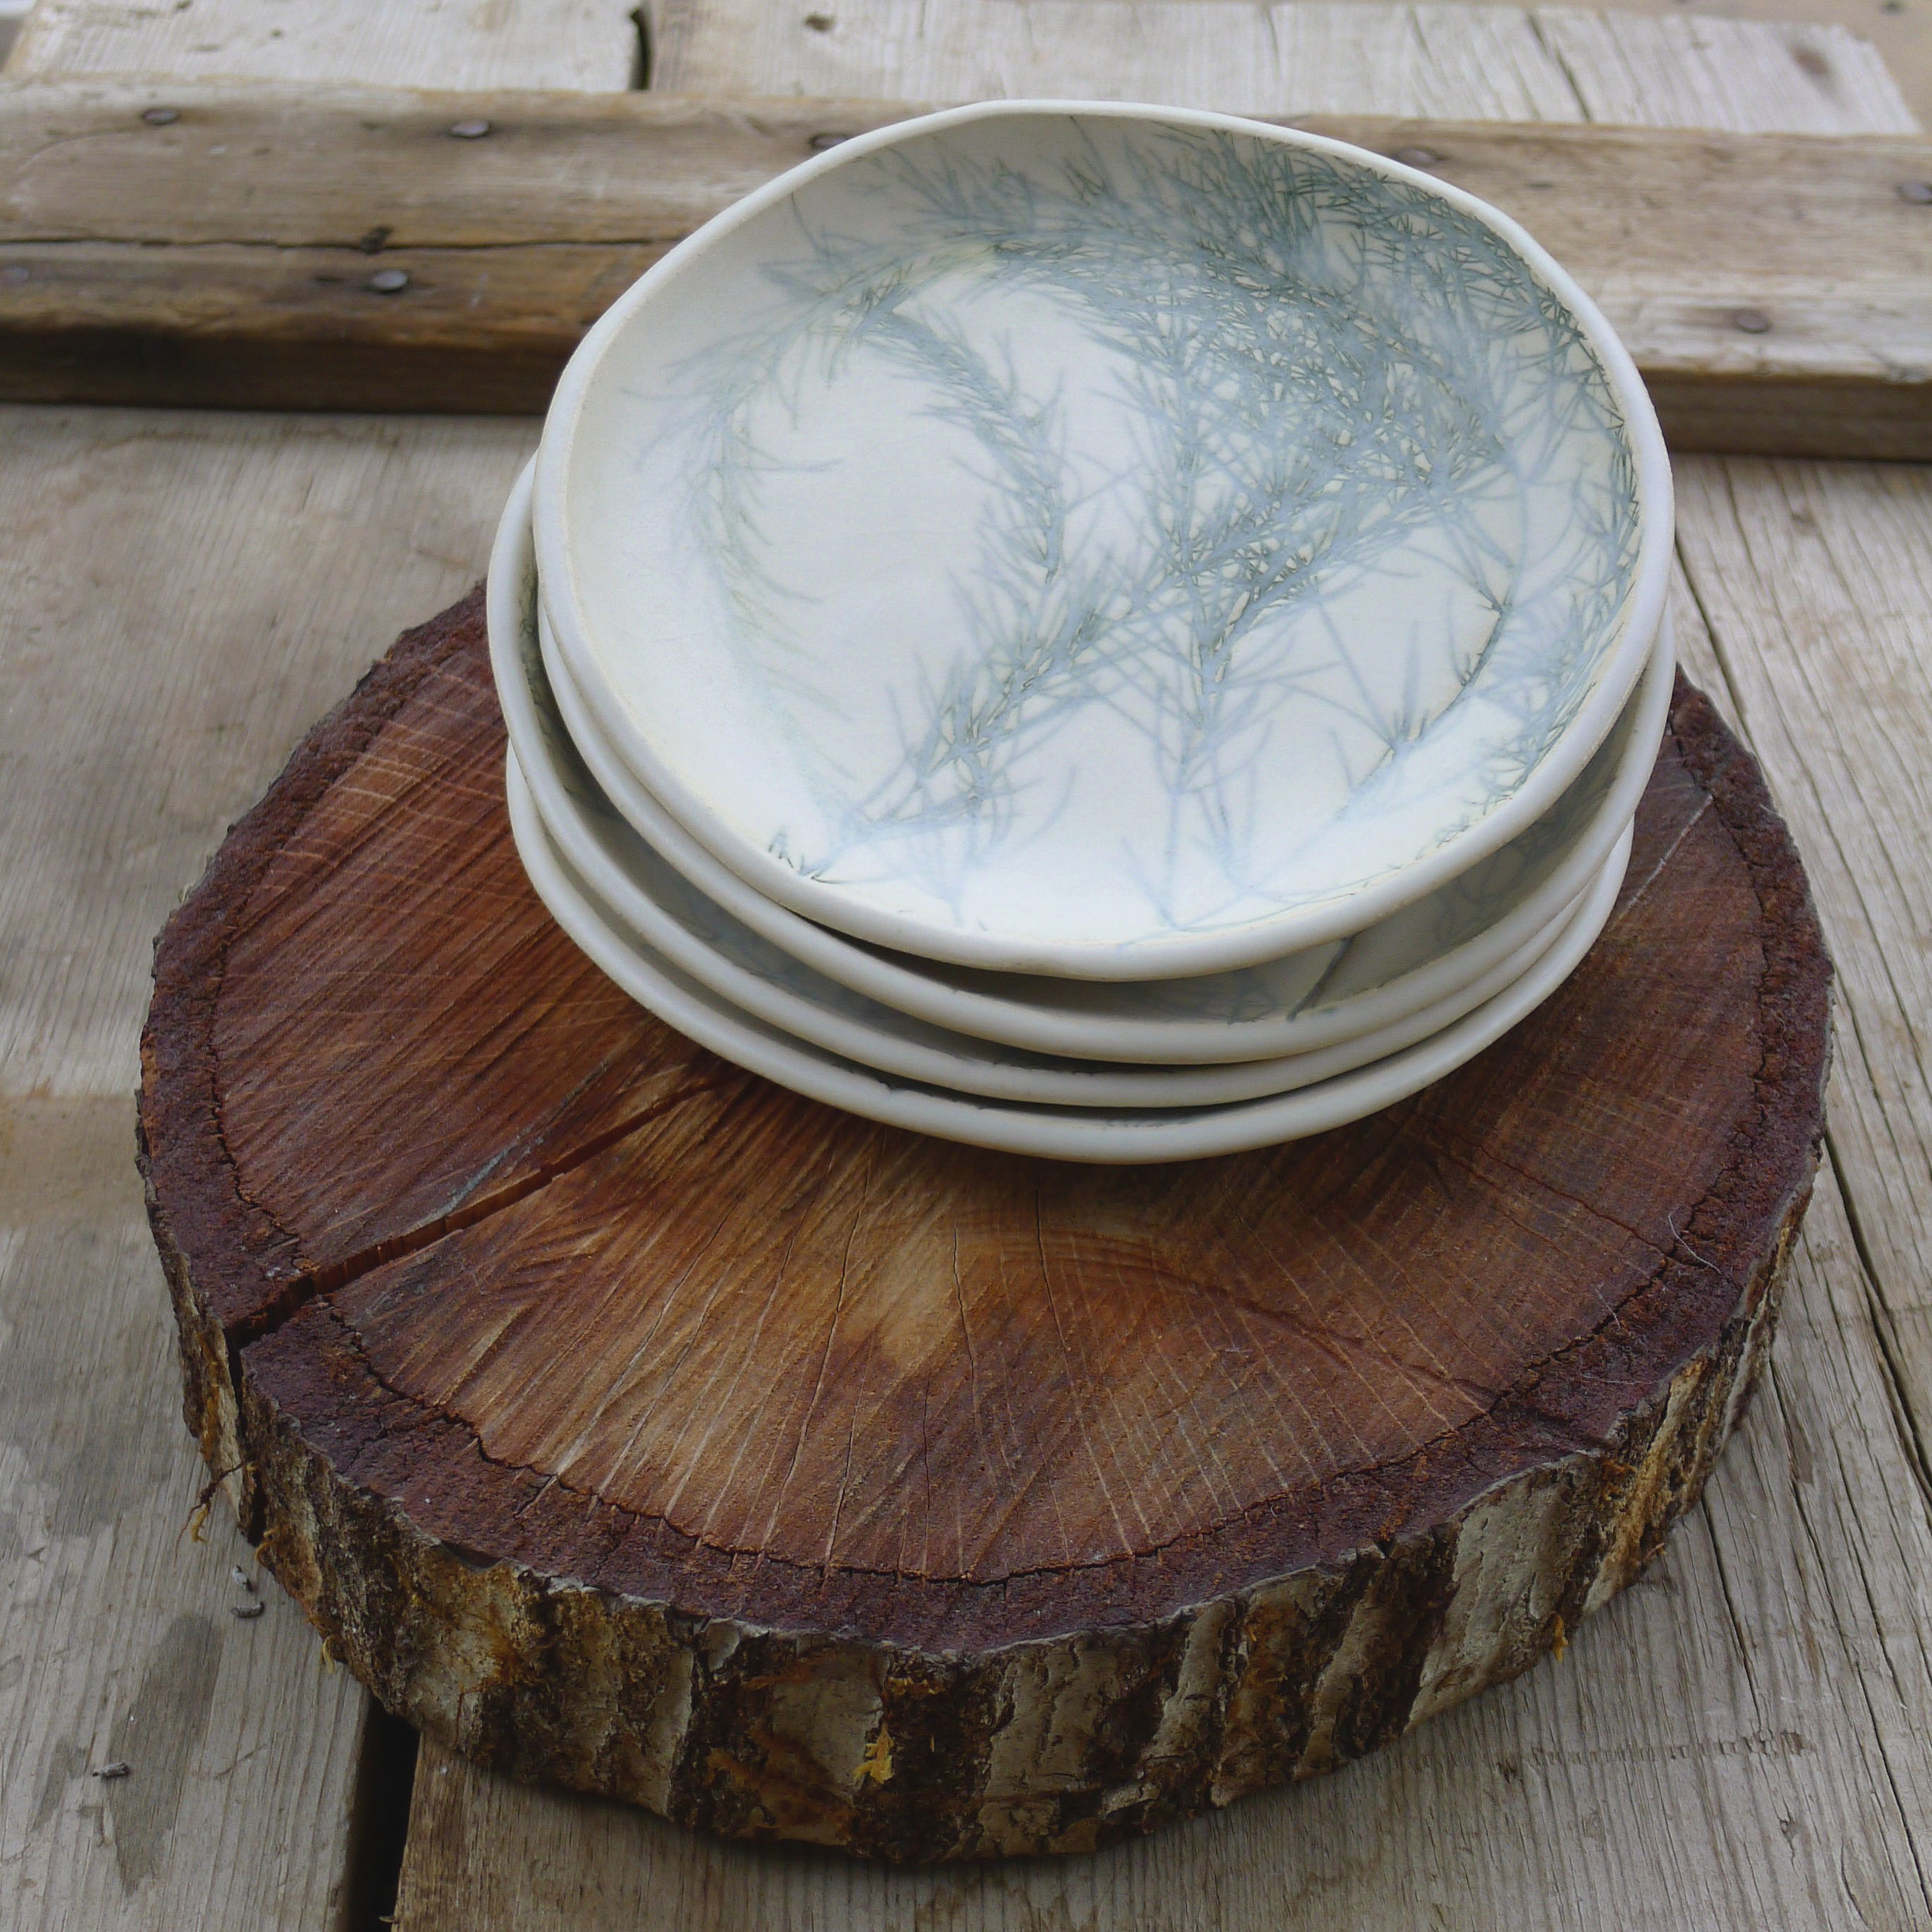 asparagus plates2.jpg